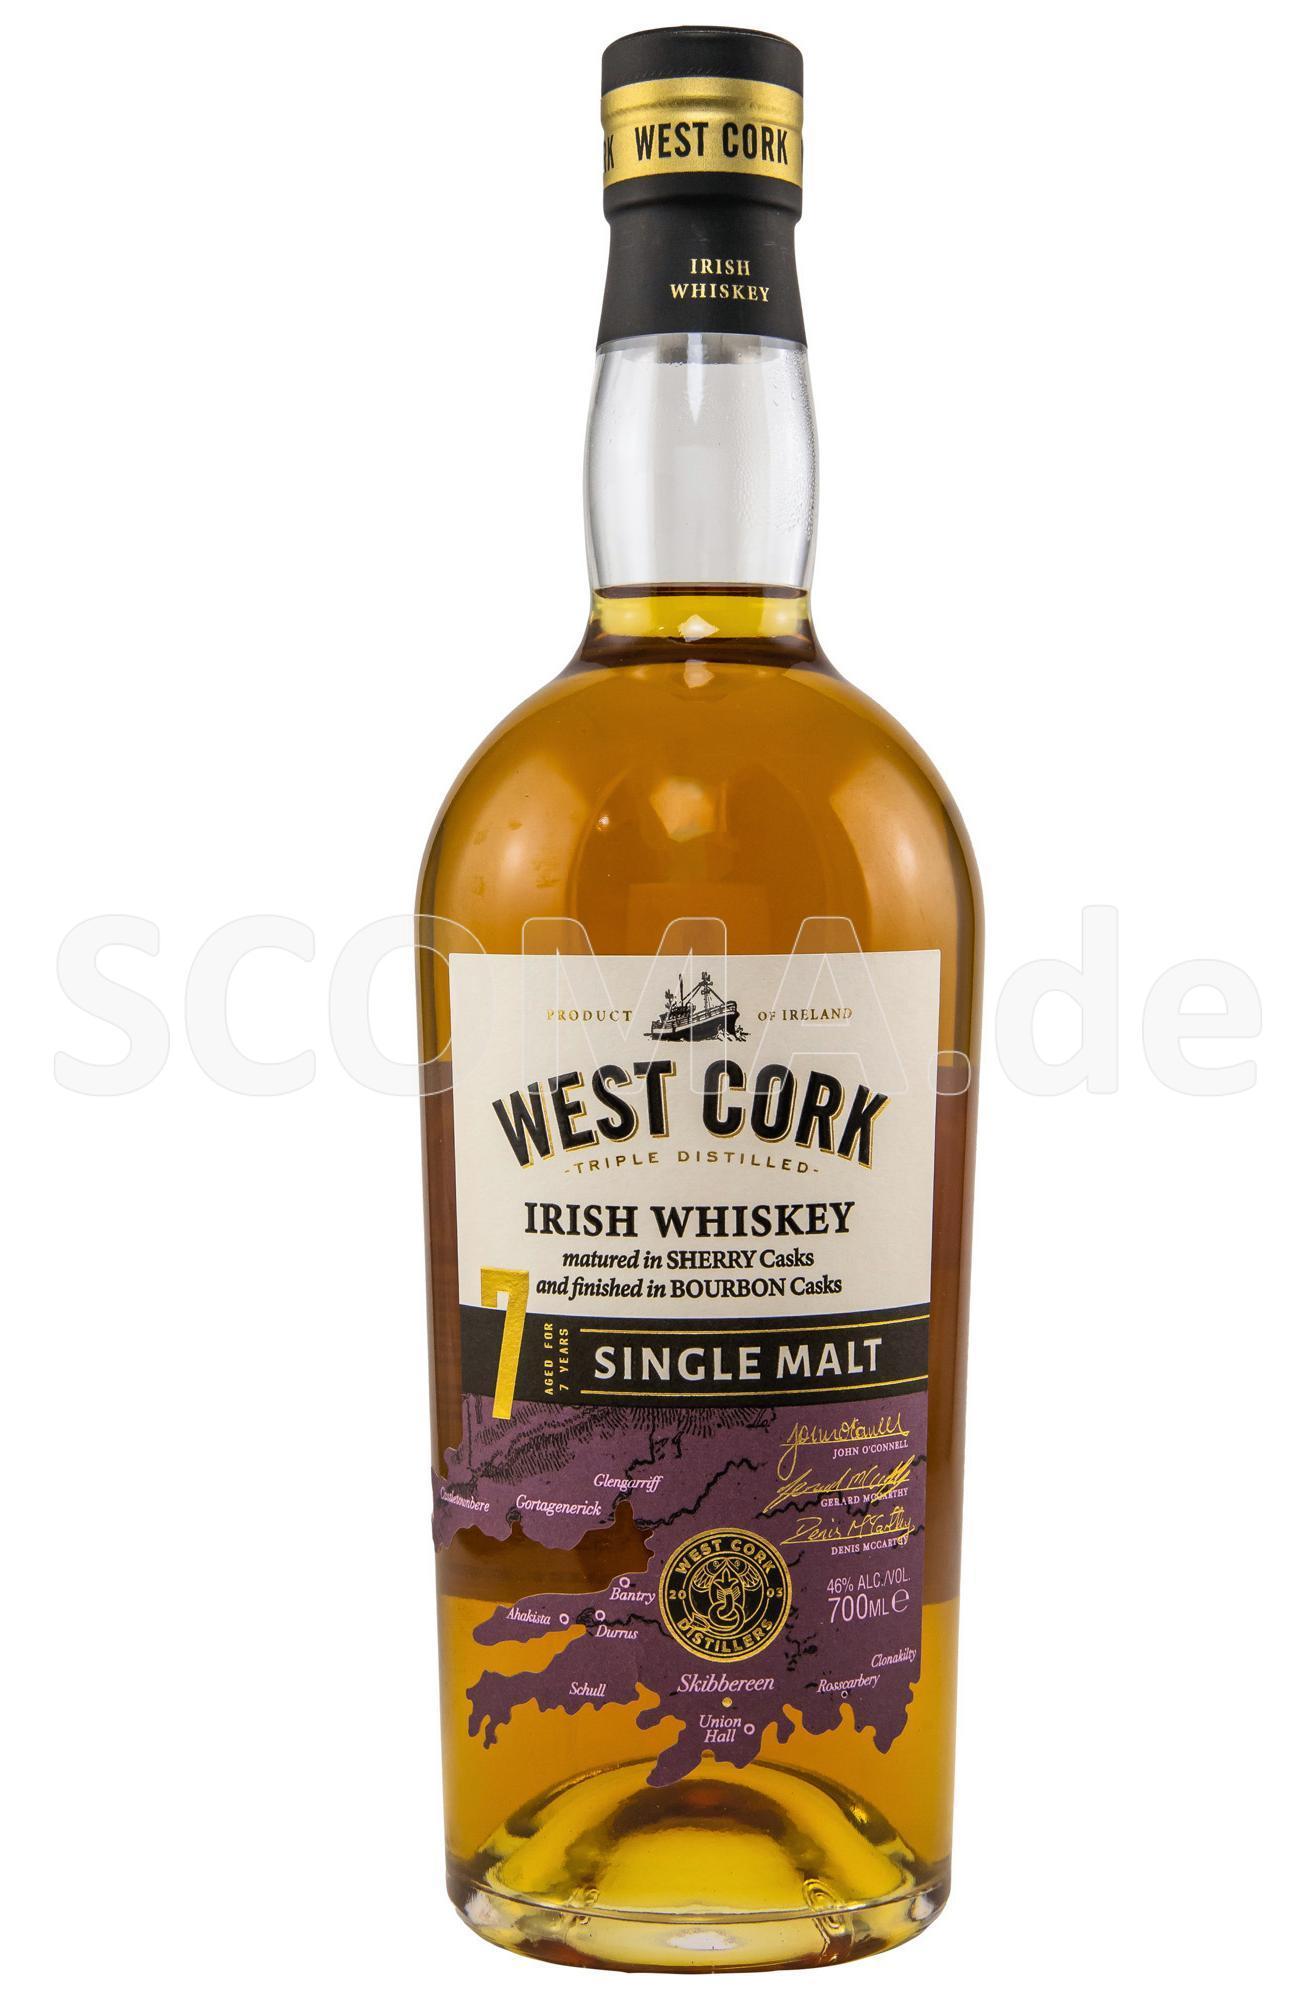 West Cork Rum Cask Finish